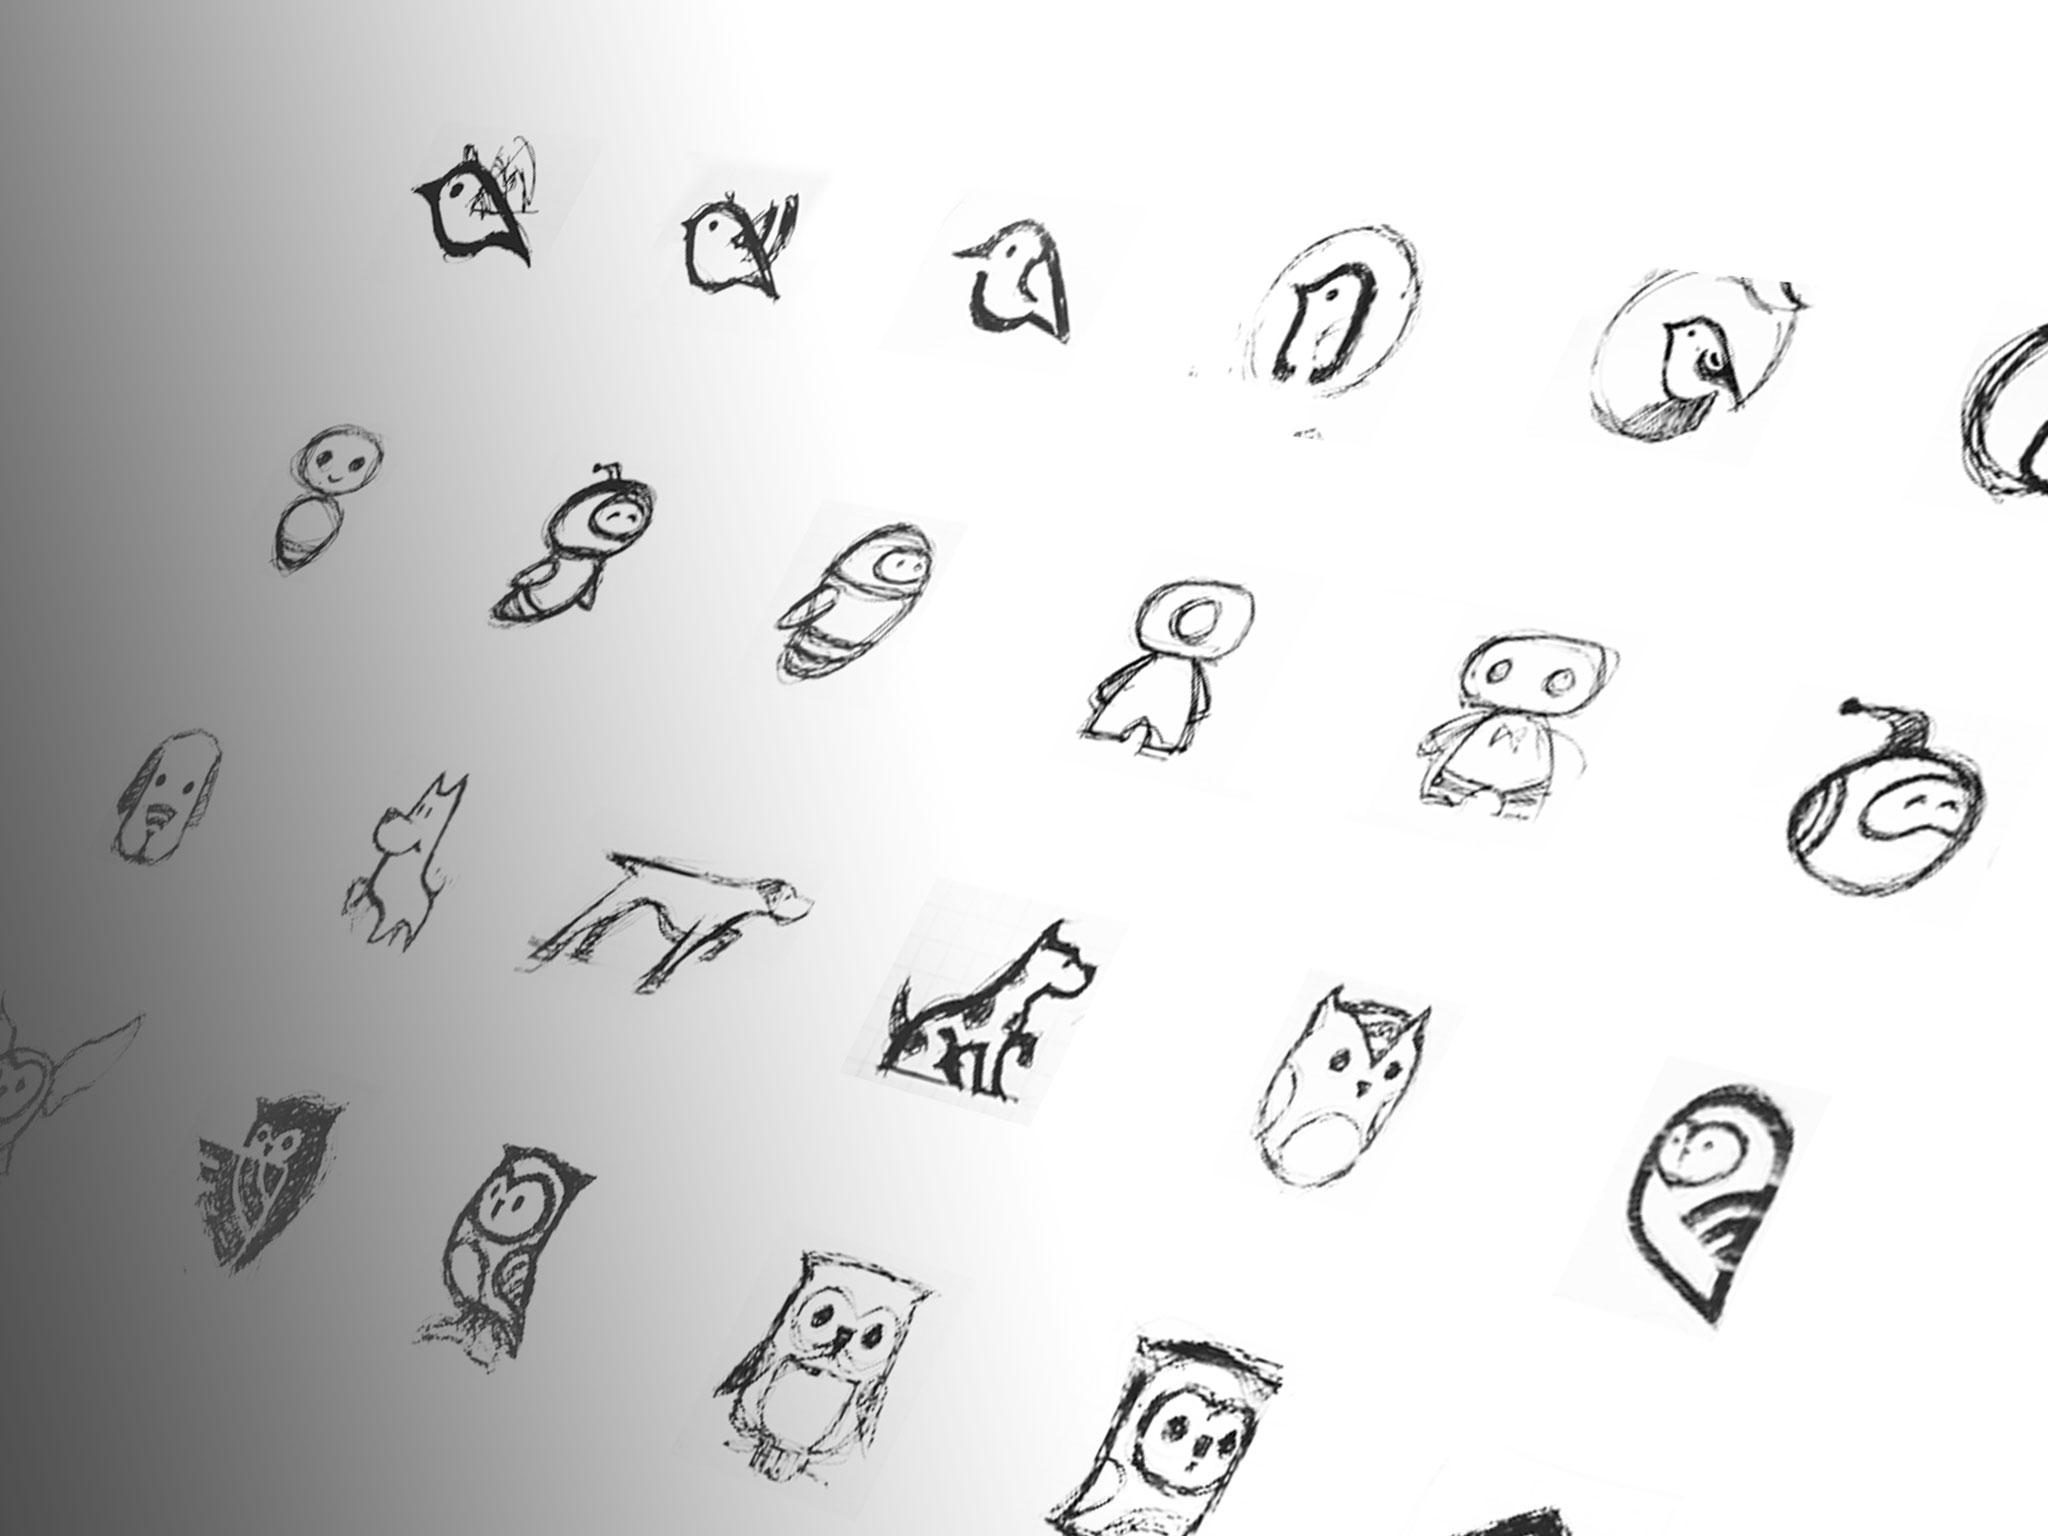 arlo-sketch-01.jpg